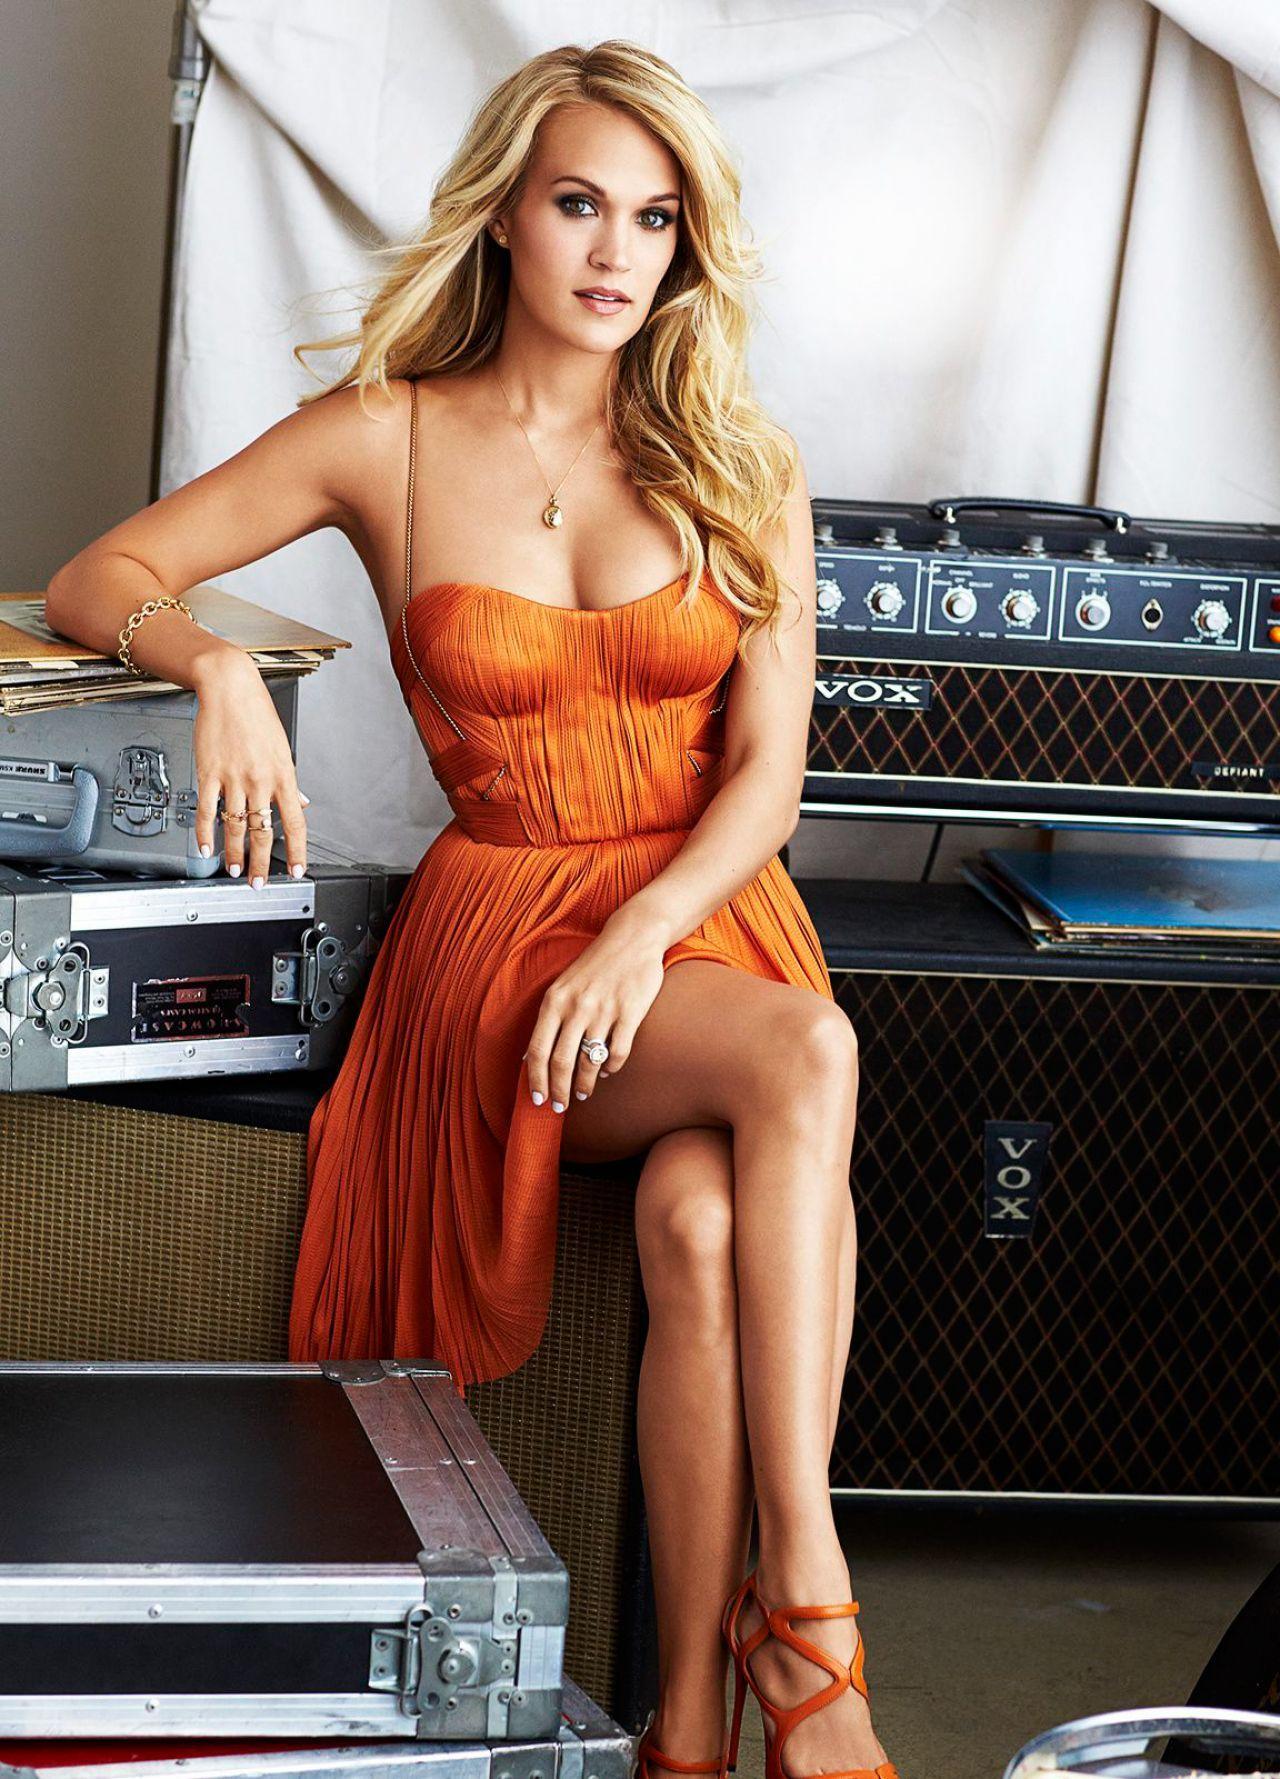 10. Carrie Underwood